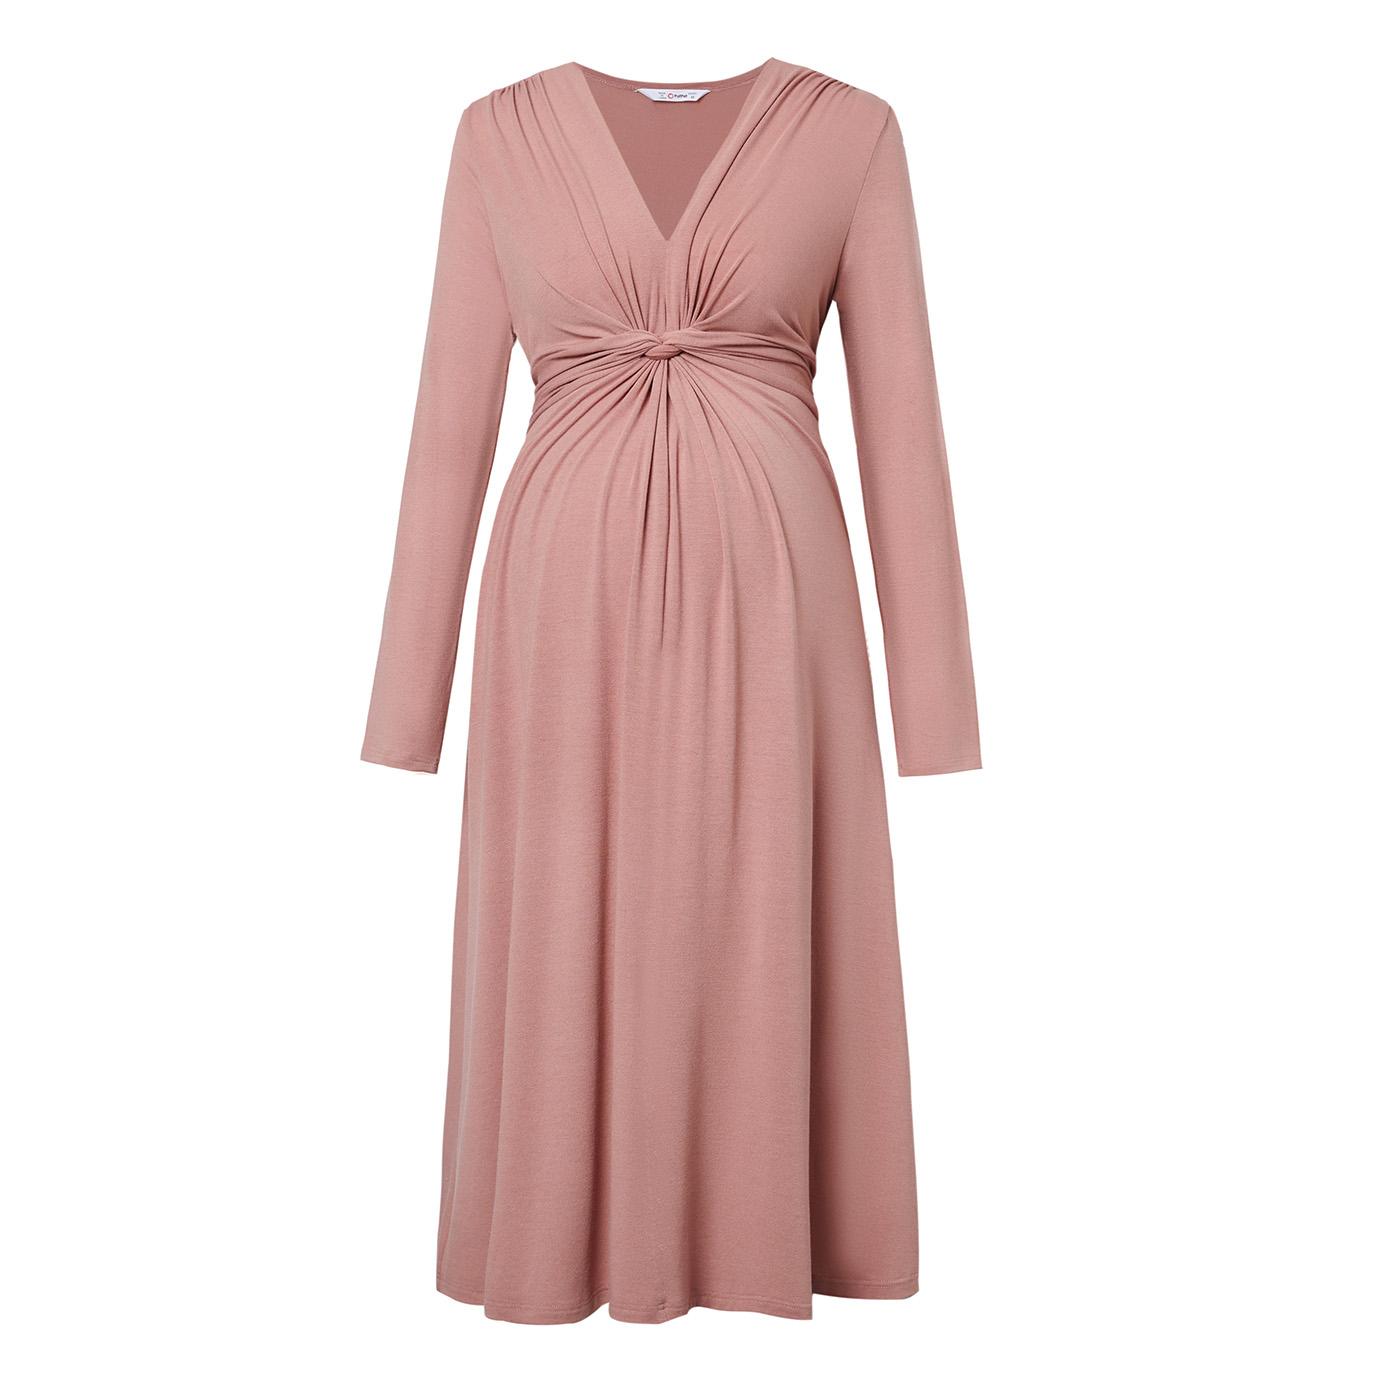 PatPat / Maternity Round collar Plain Dark Pink Normal Parachute skirt Long-sleeve Dress